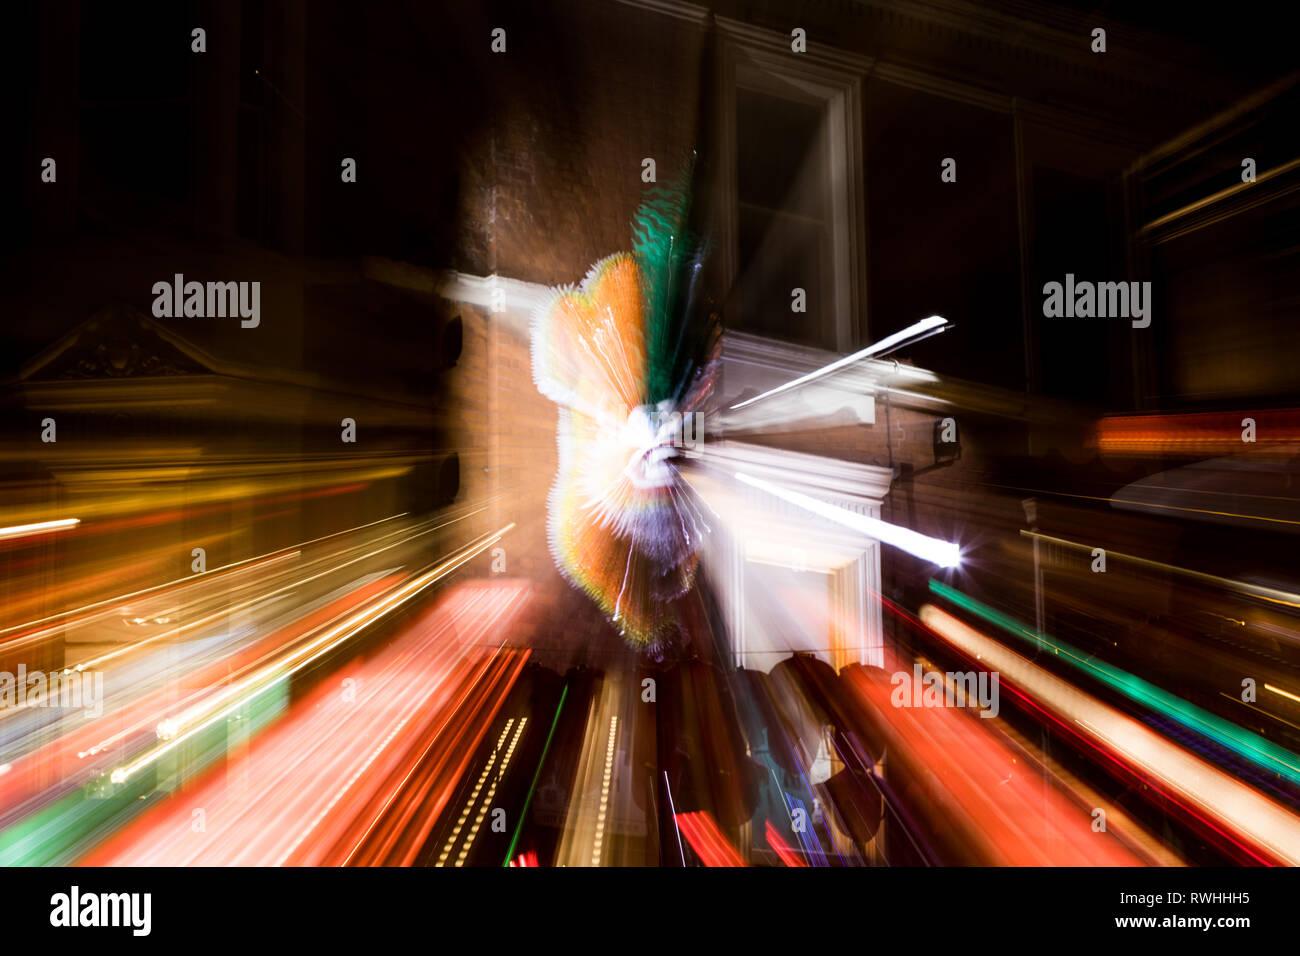 Zoom burst shot at Piccadilly Circus, London - Stock Image